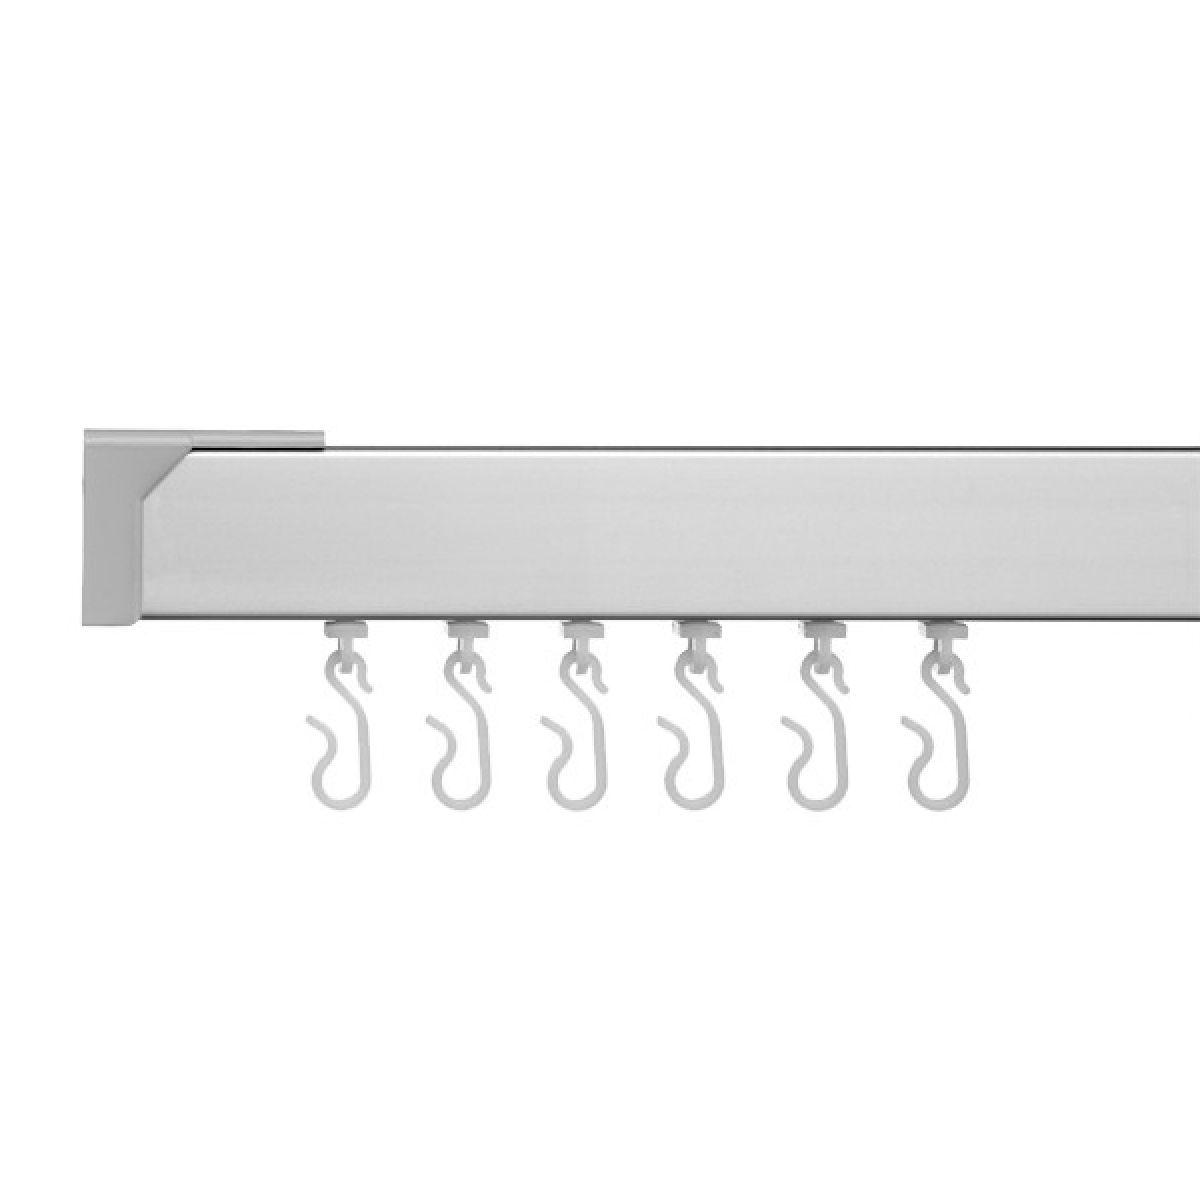 Croydex Profile 400 Straight Silver Shower Curtain Rail